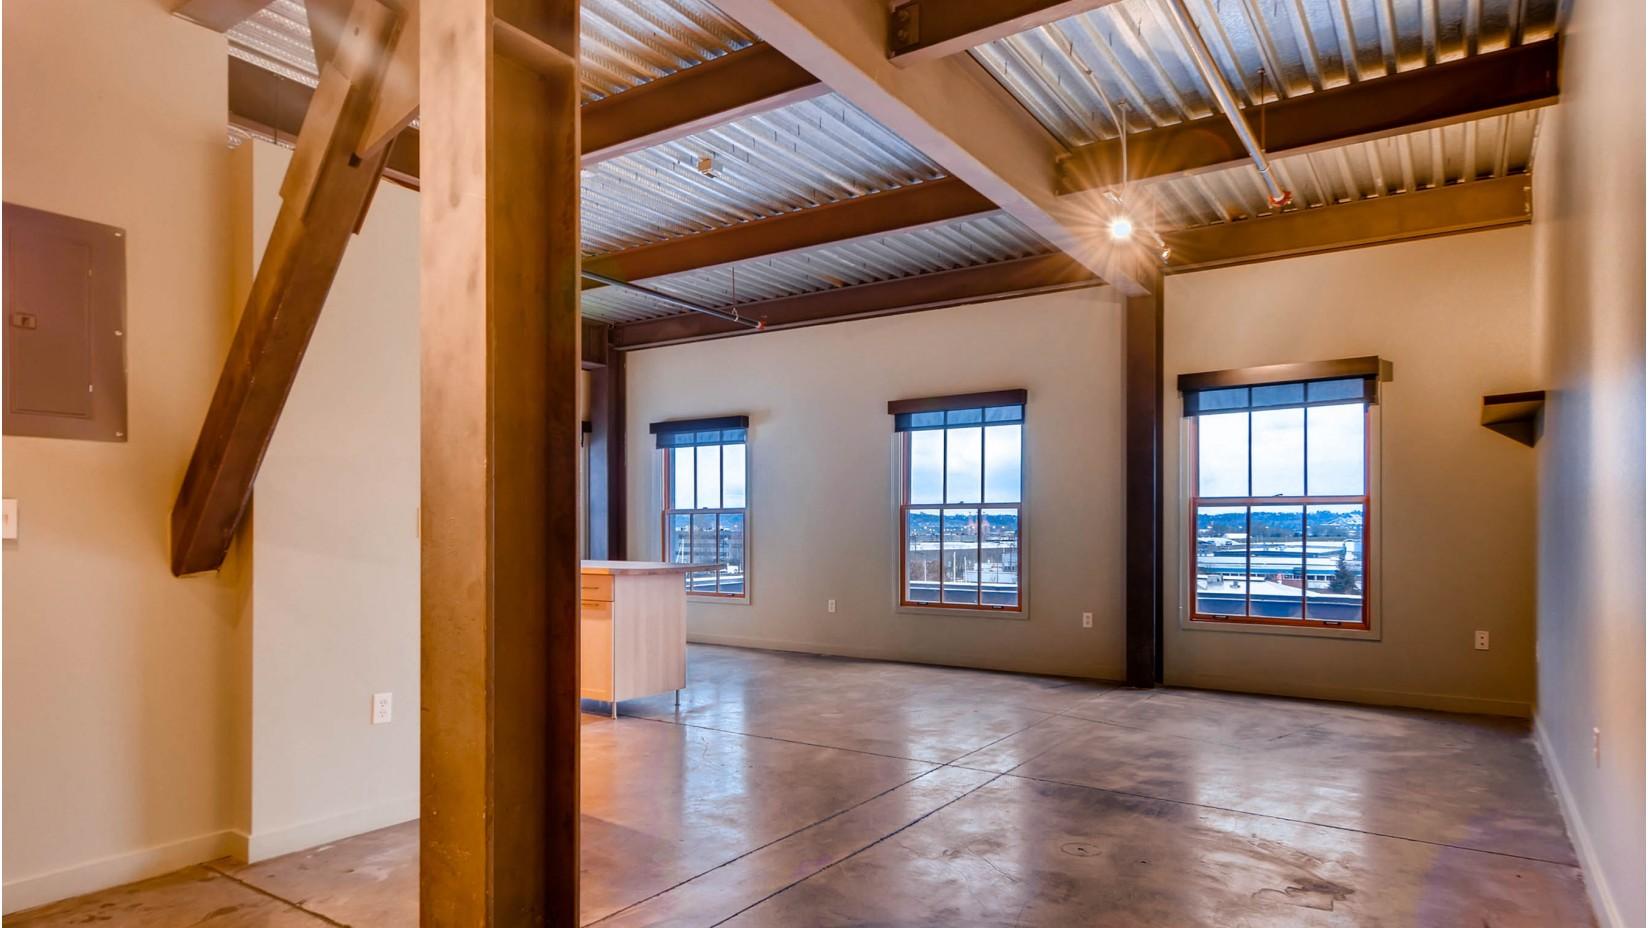 Loft Apartments Tacoma Wa